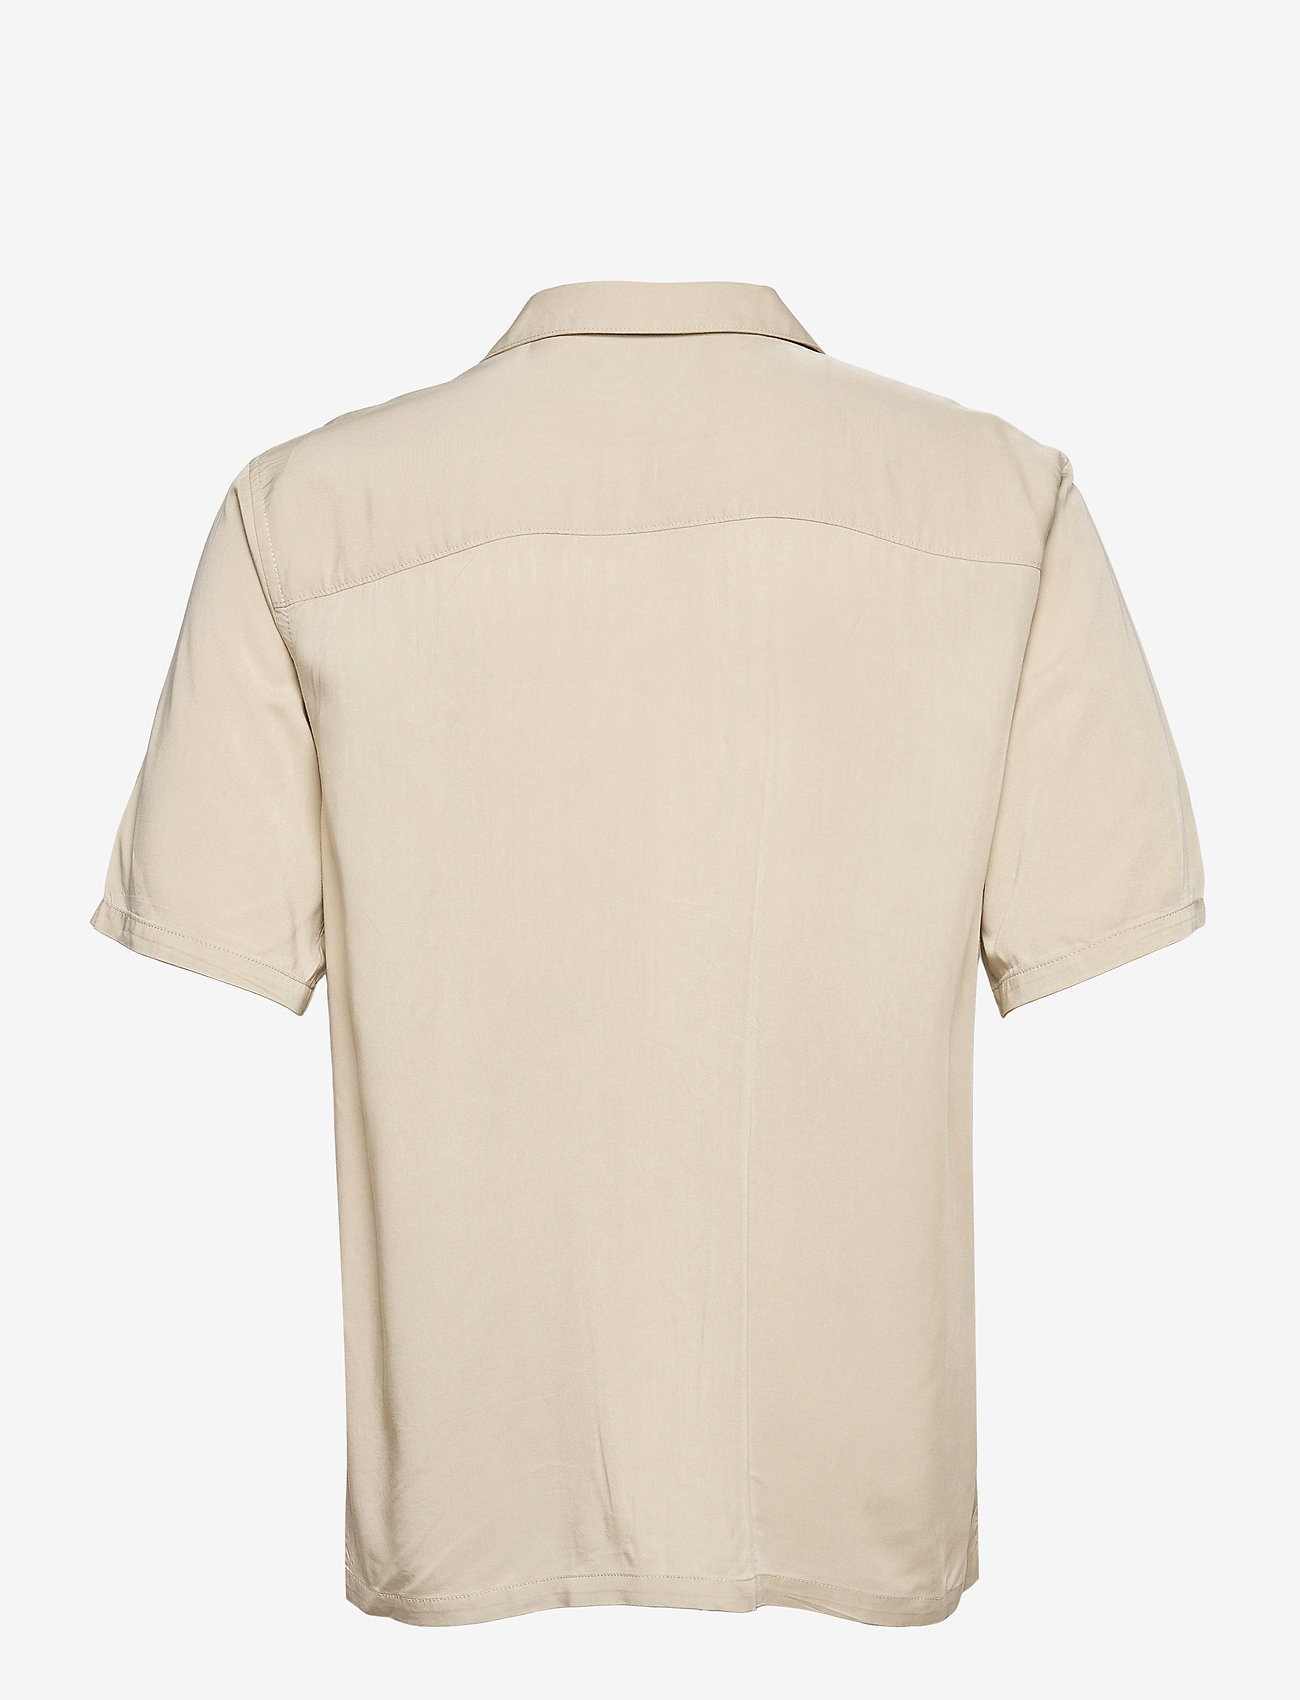 ONLY & SONS - ONSSCOTTIE LIFE SS UTILITY RELAXED SHIRT - koszule w kratkę - pelican - 1